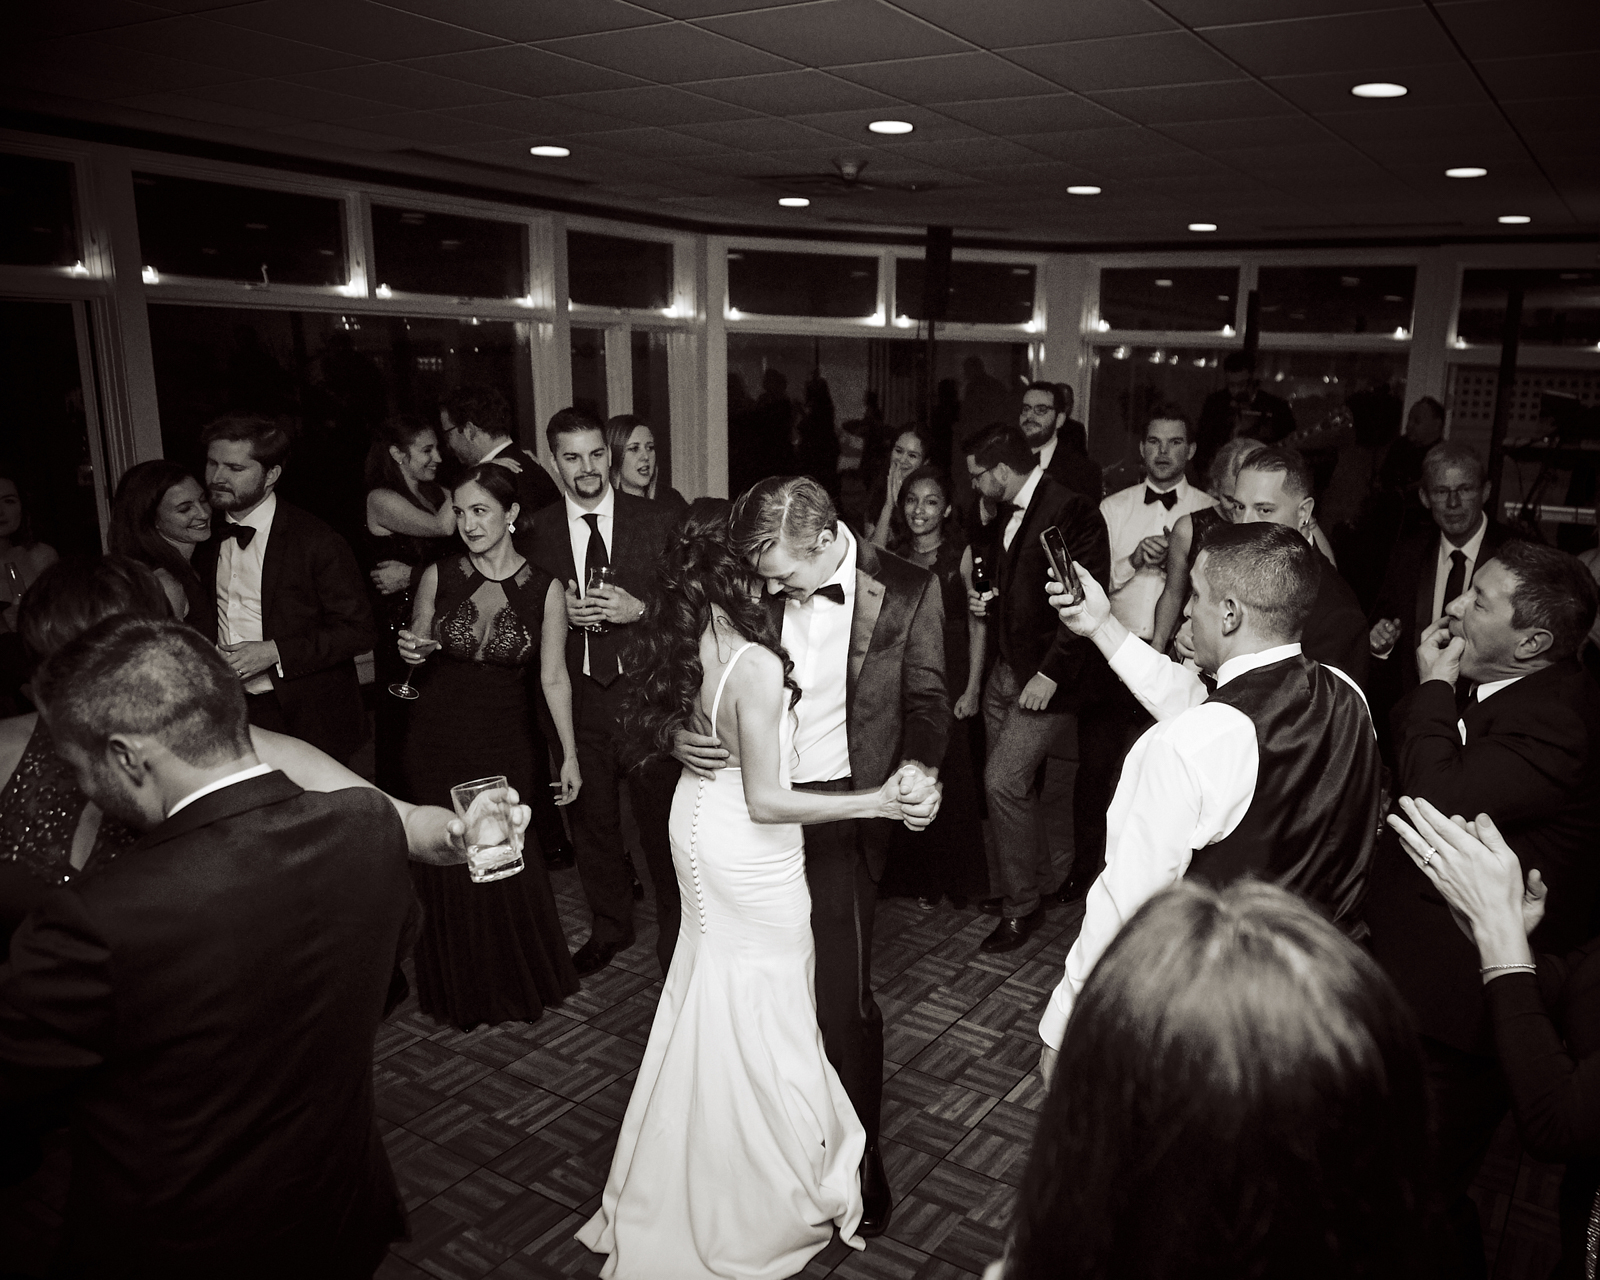 181020_KatherineScottWedding_DanceParty 141.jpg